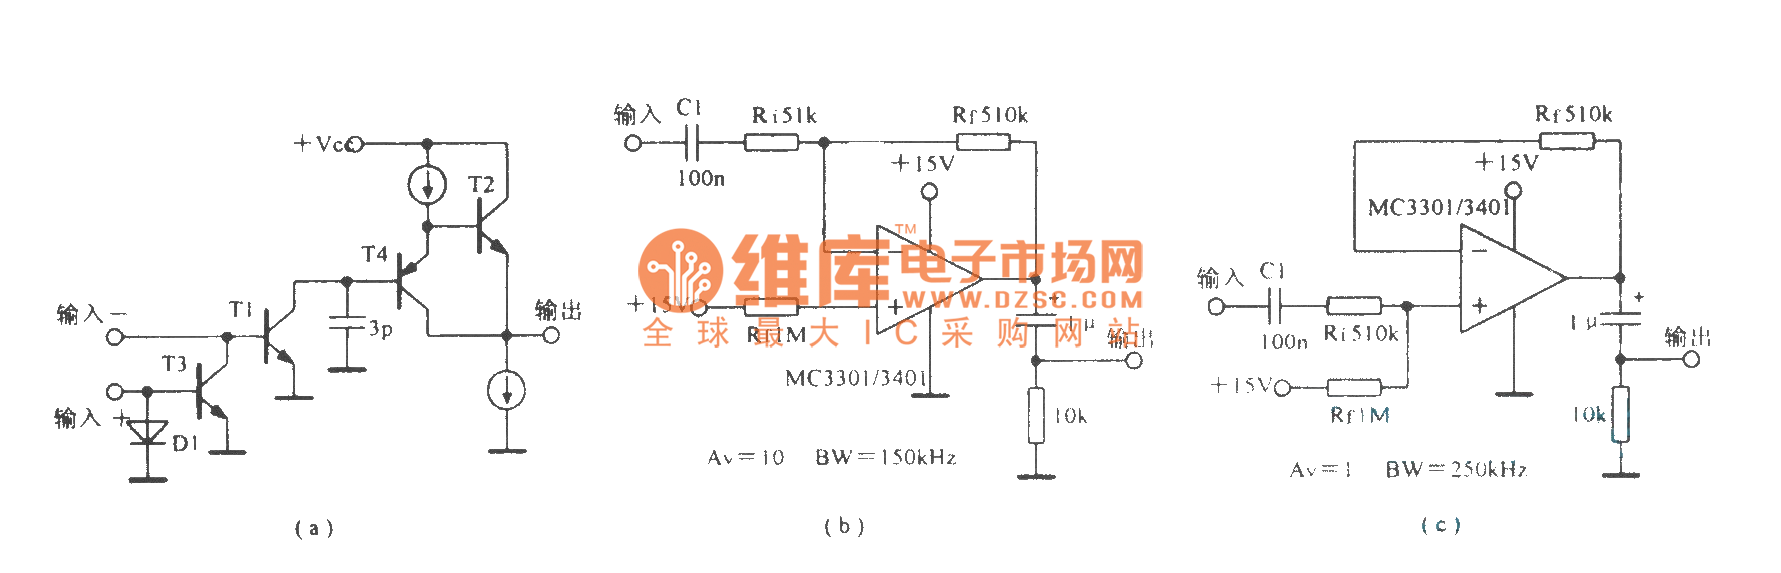 Current Comparator Norton Four Op Amp Mc3301 3401 Circuits